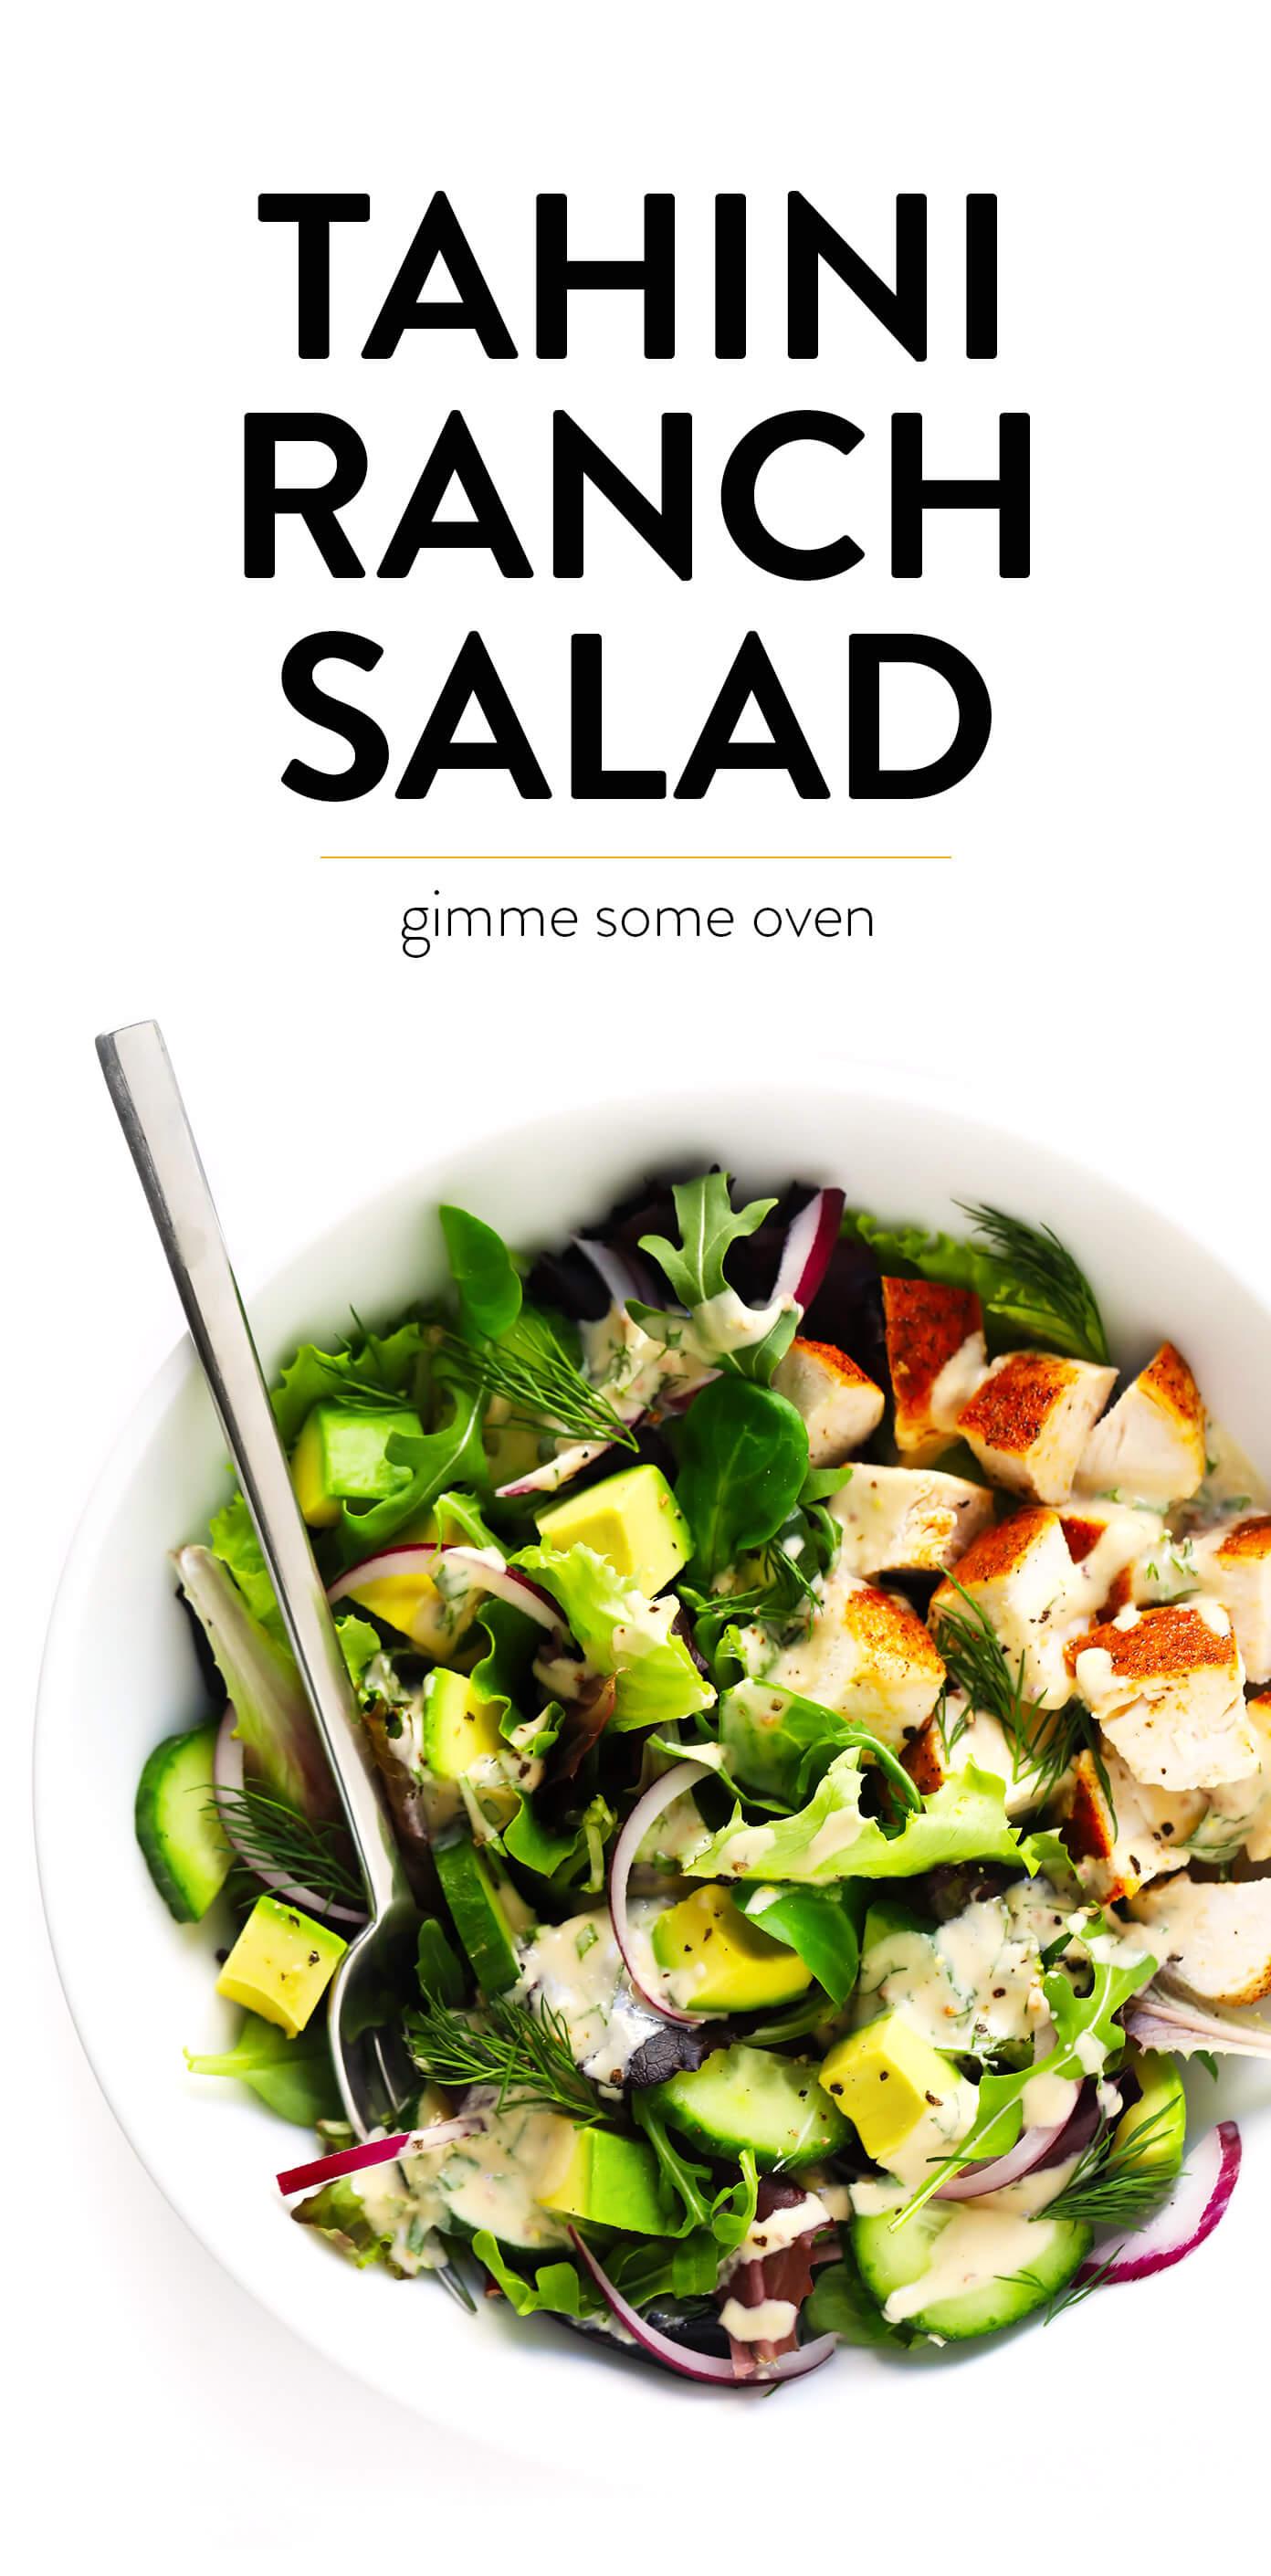 Tahini Ranch Salad Recipe